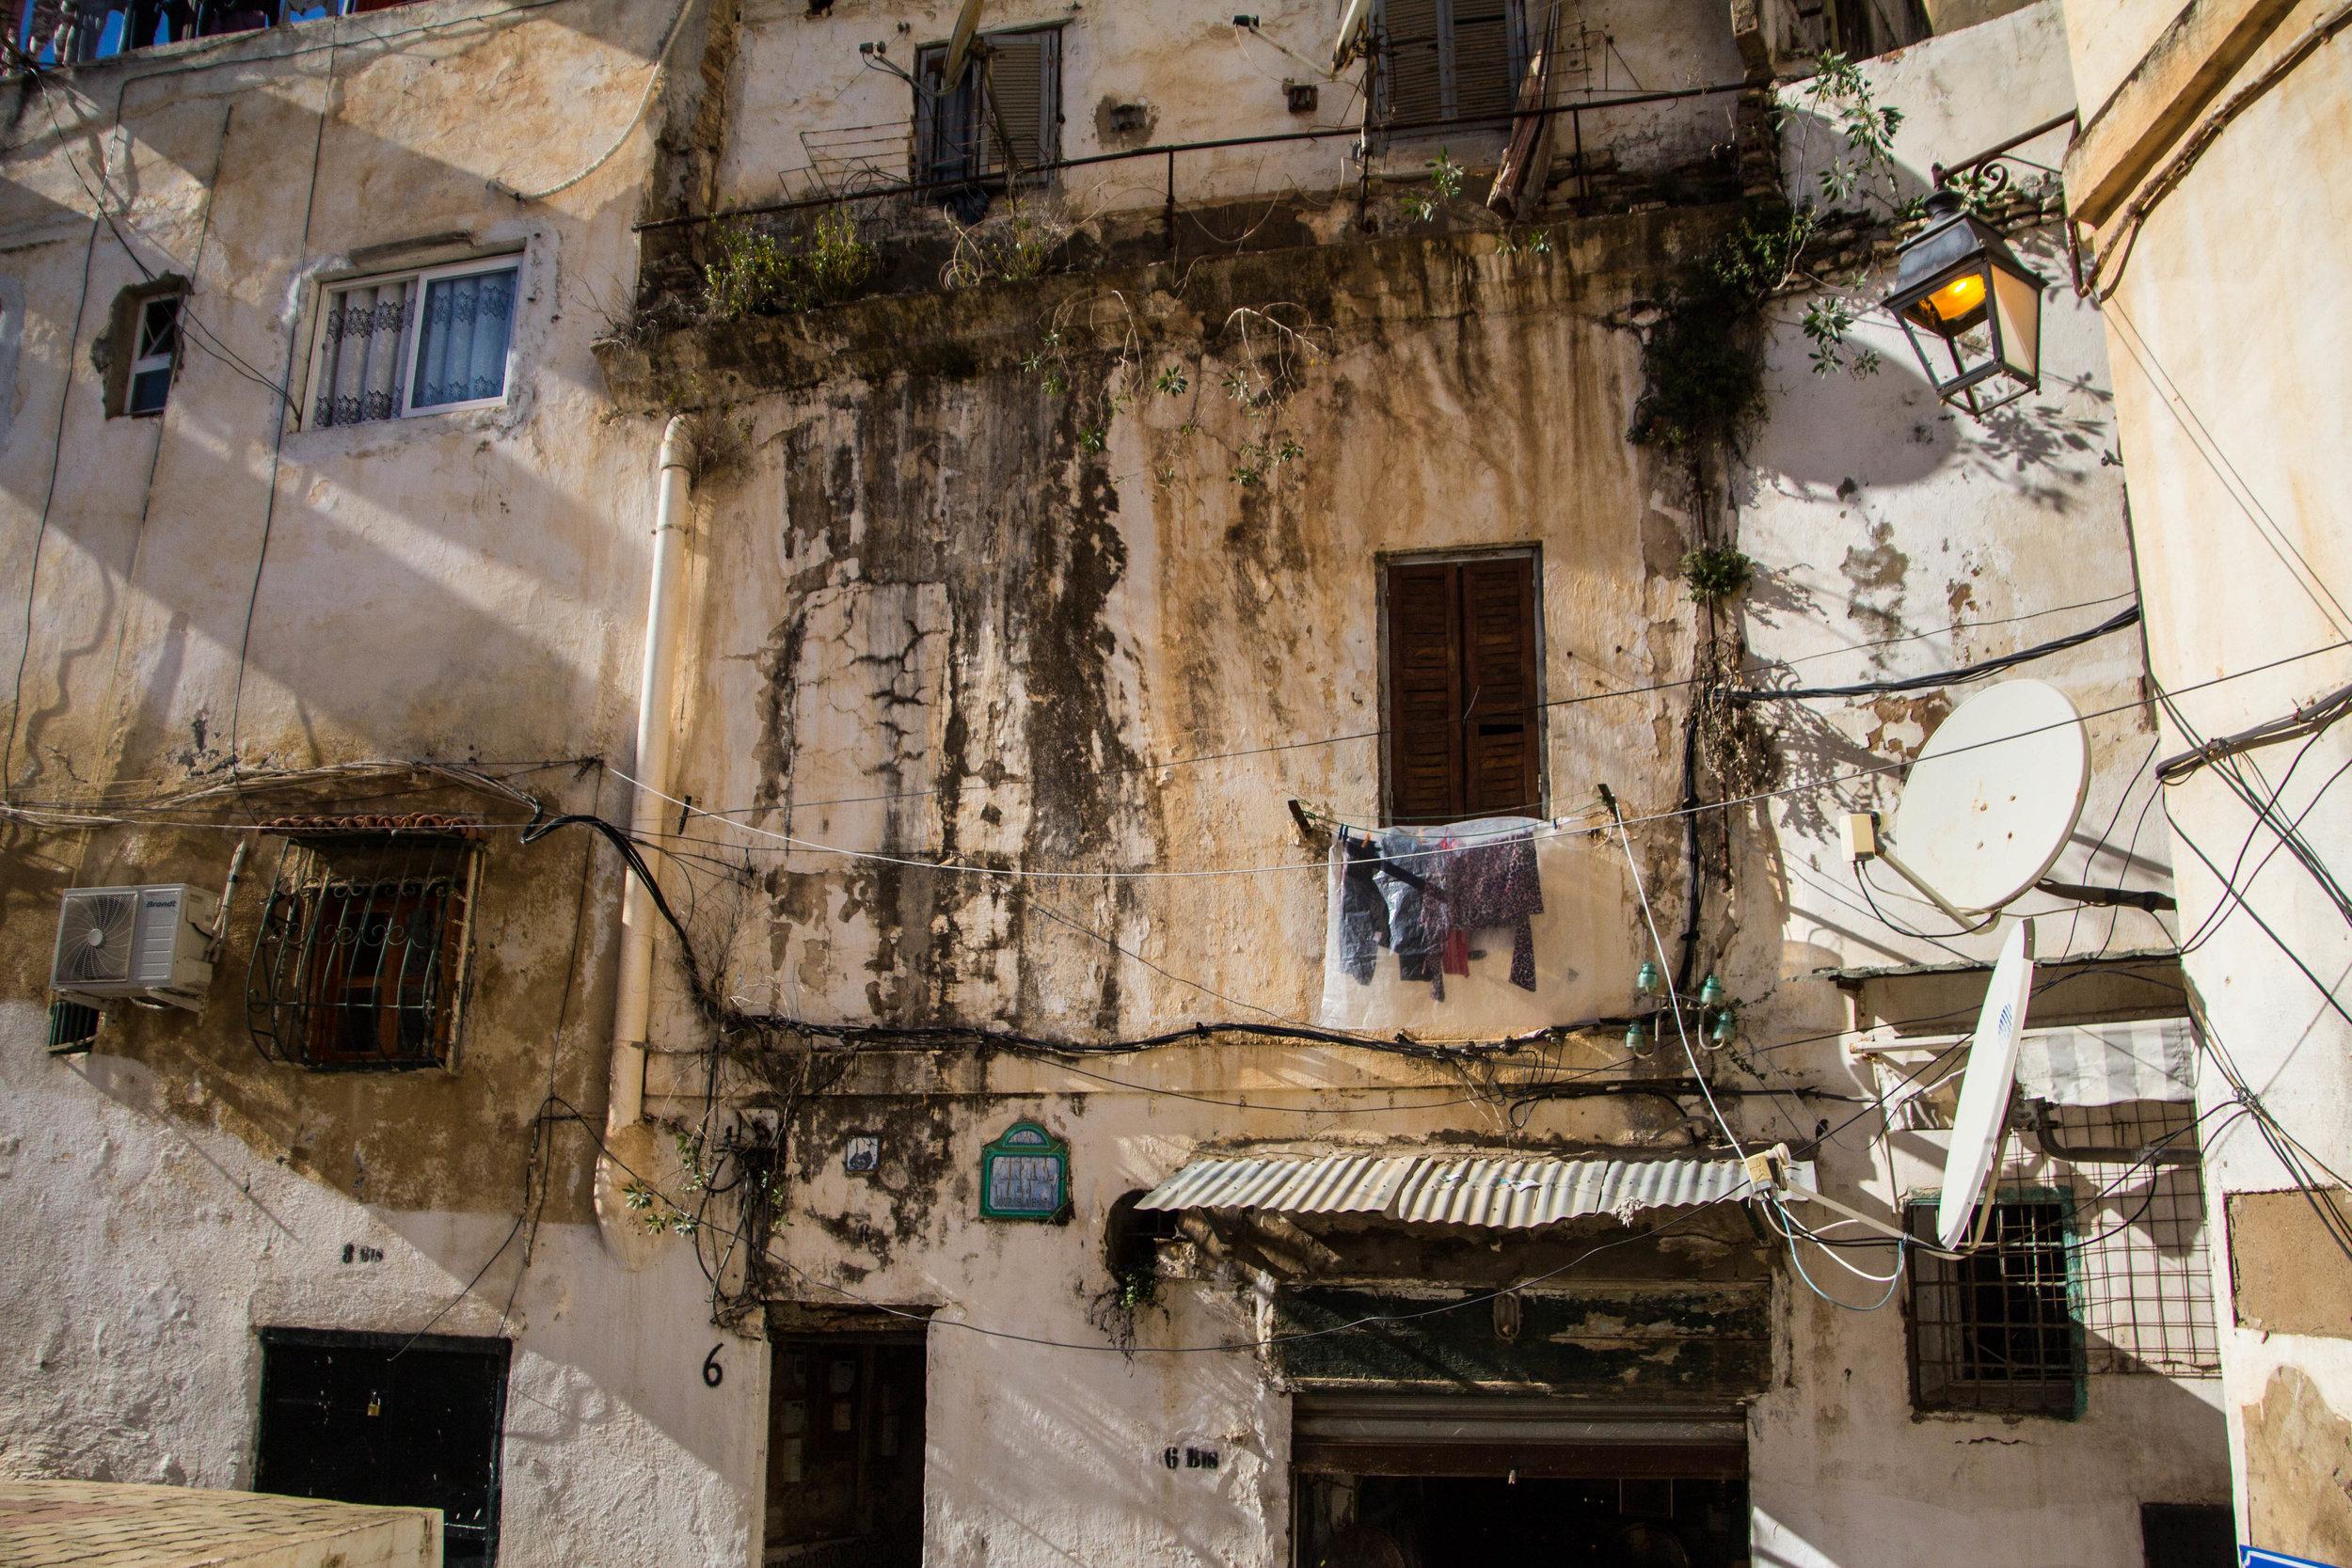 casbah-photography-algiers-algeria-alger-55.jpg